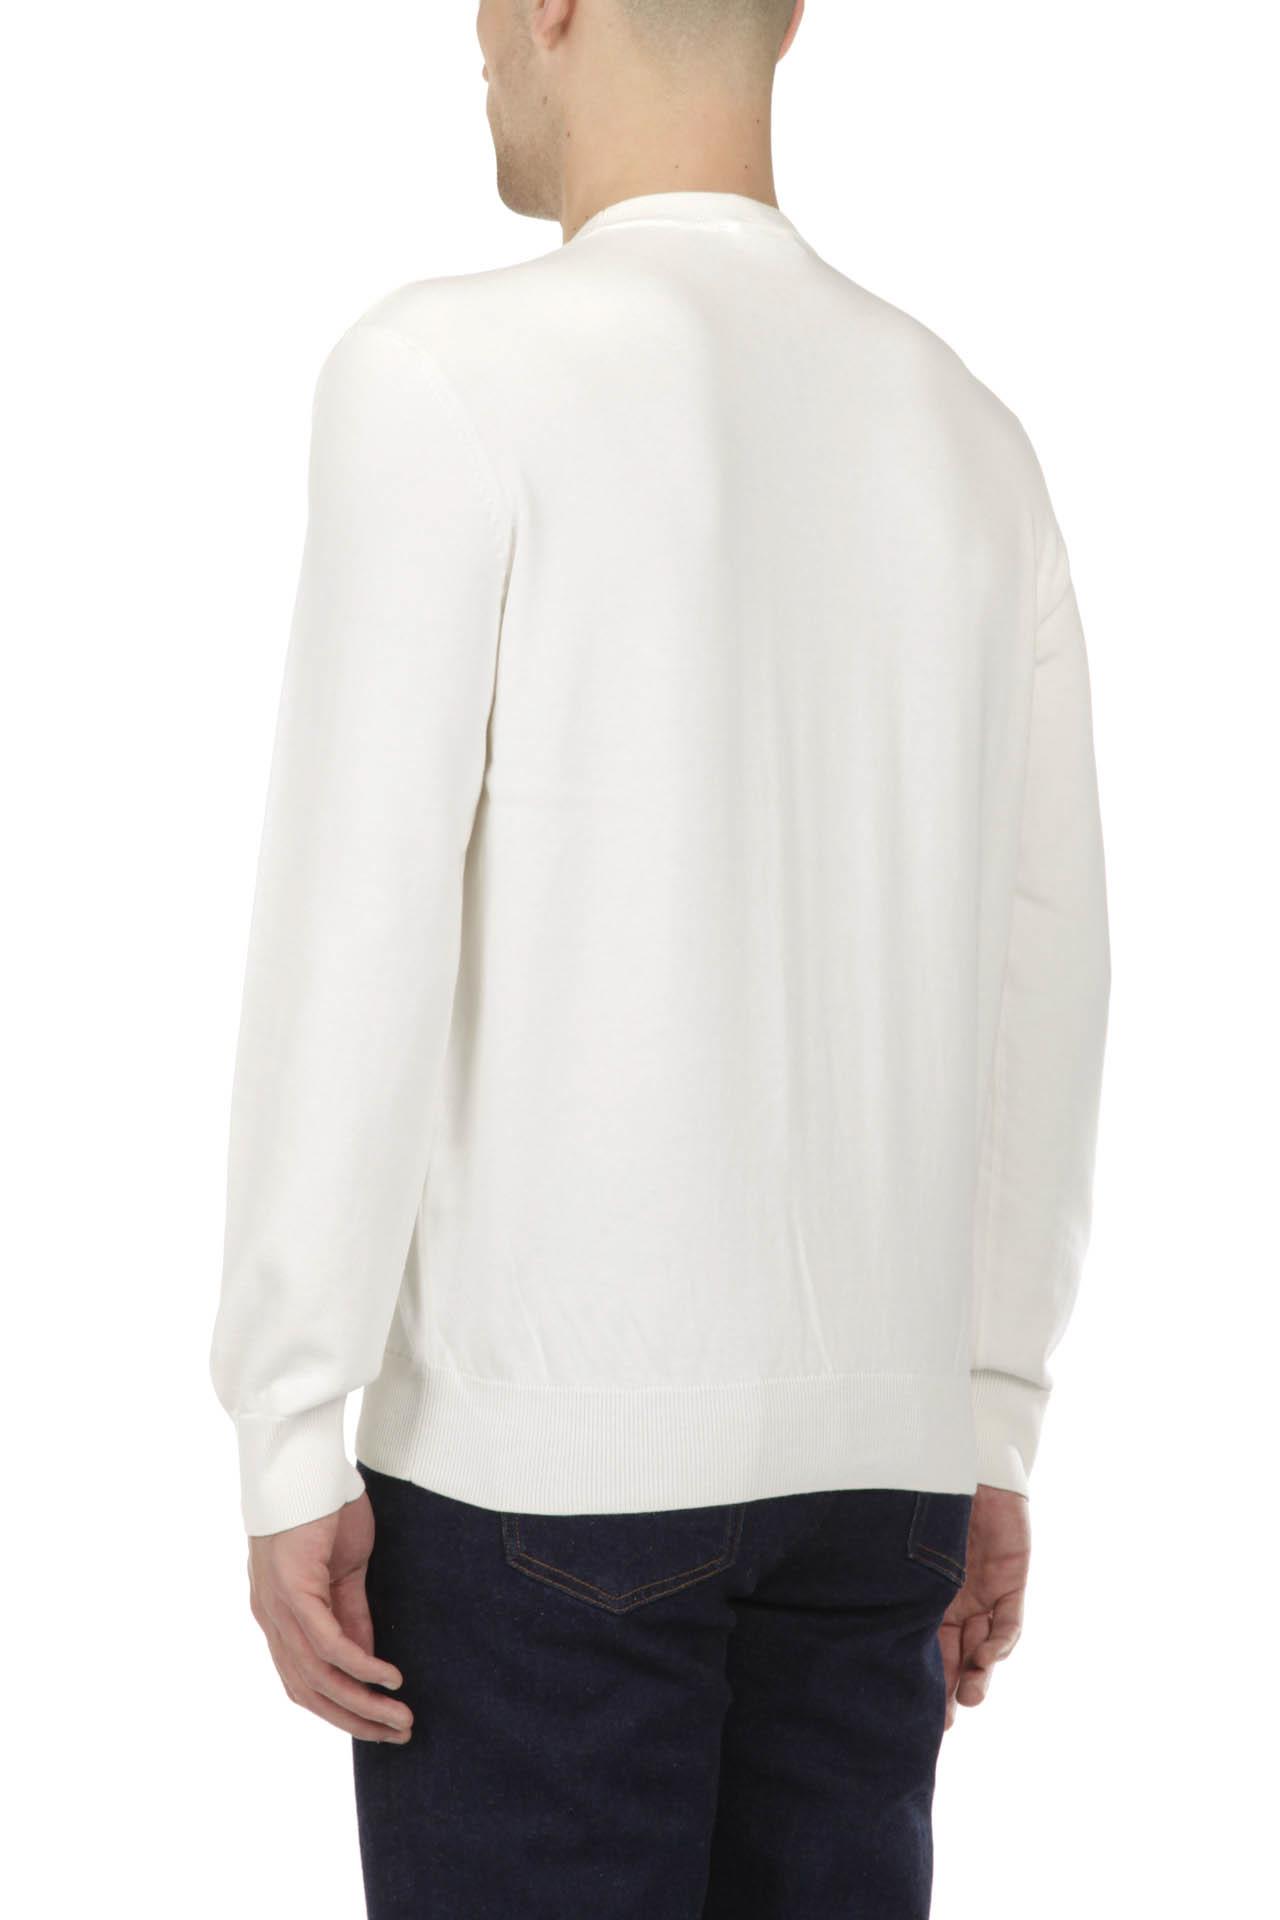 APC   Knitwear   CODDAH23866